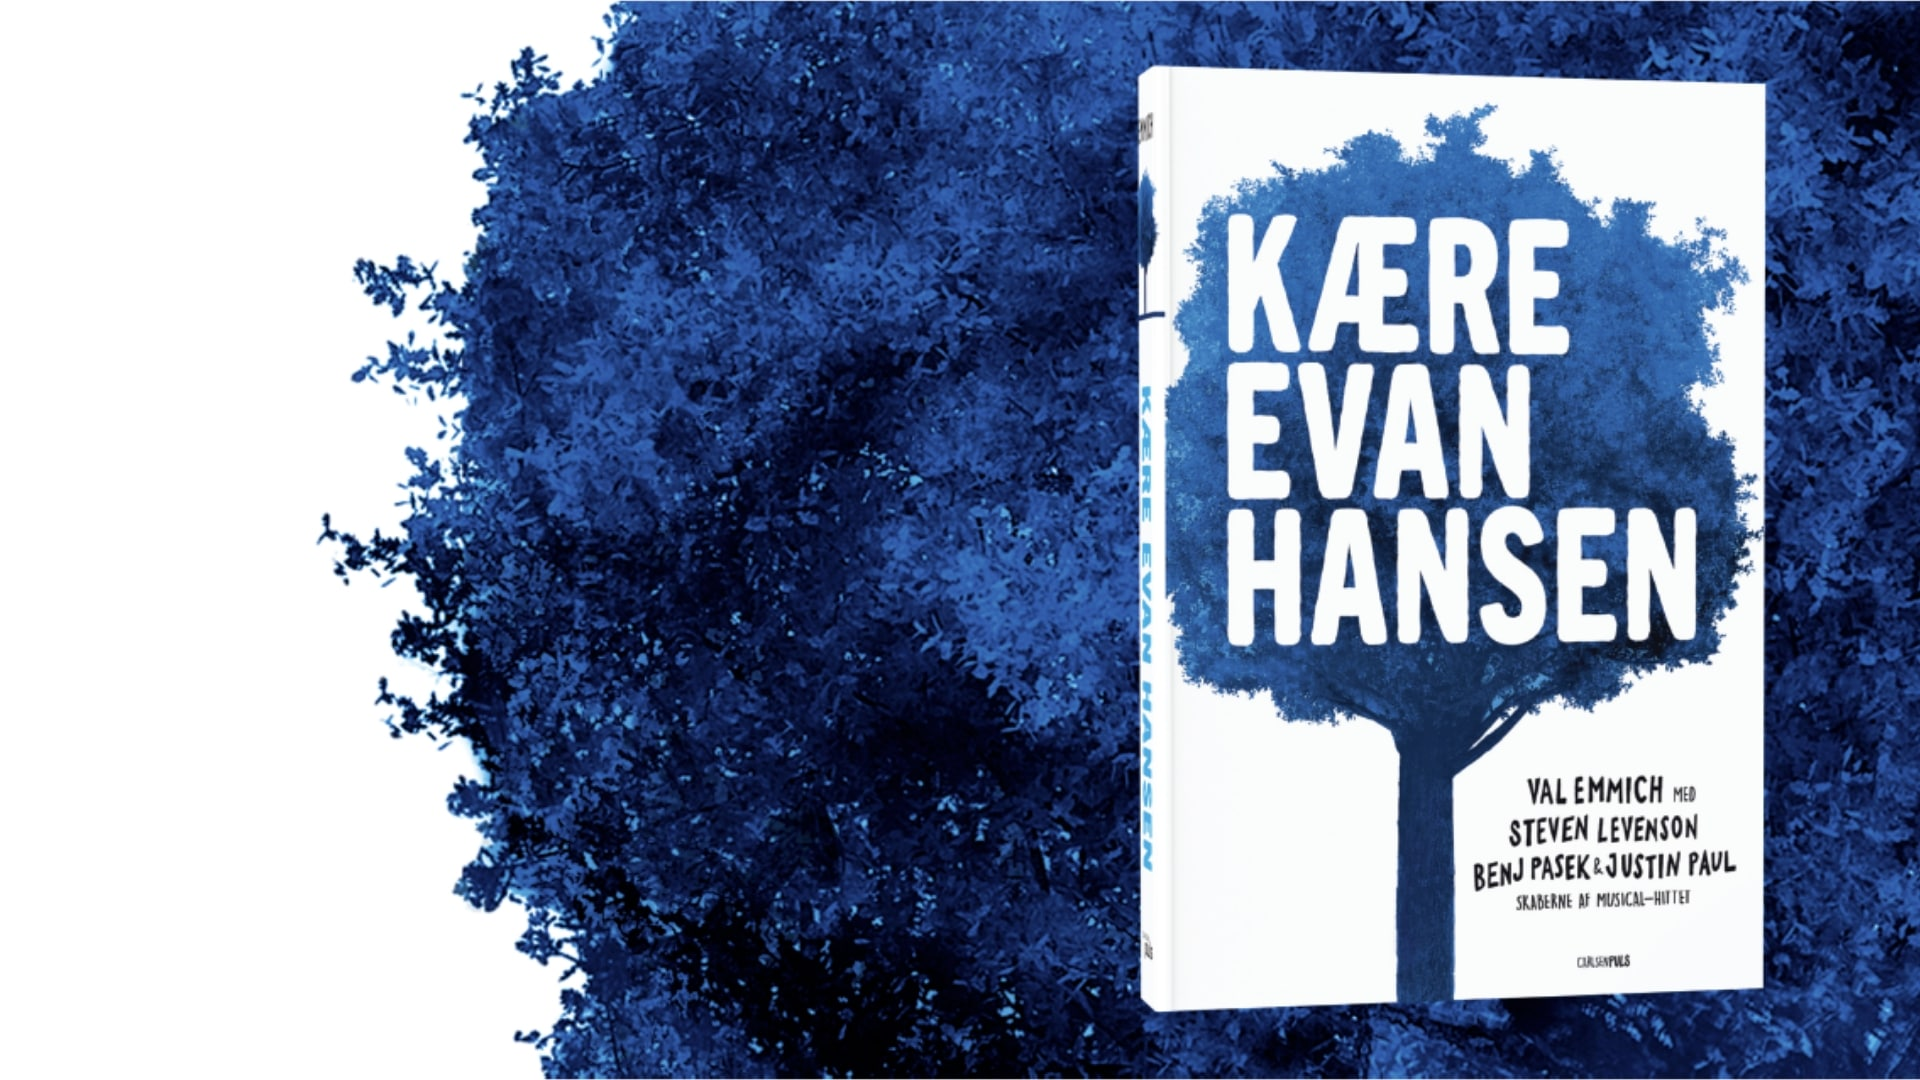 Kære Evan Hansen, musical, bog, teenager